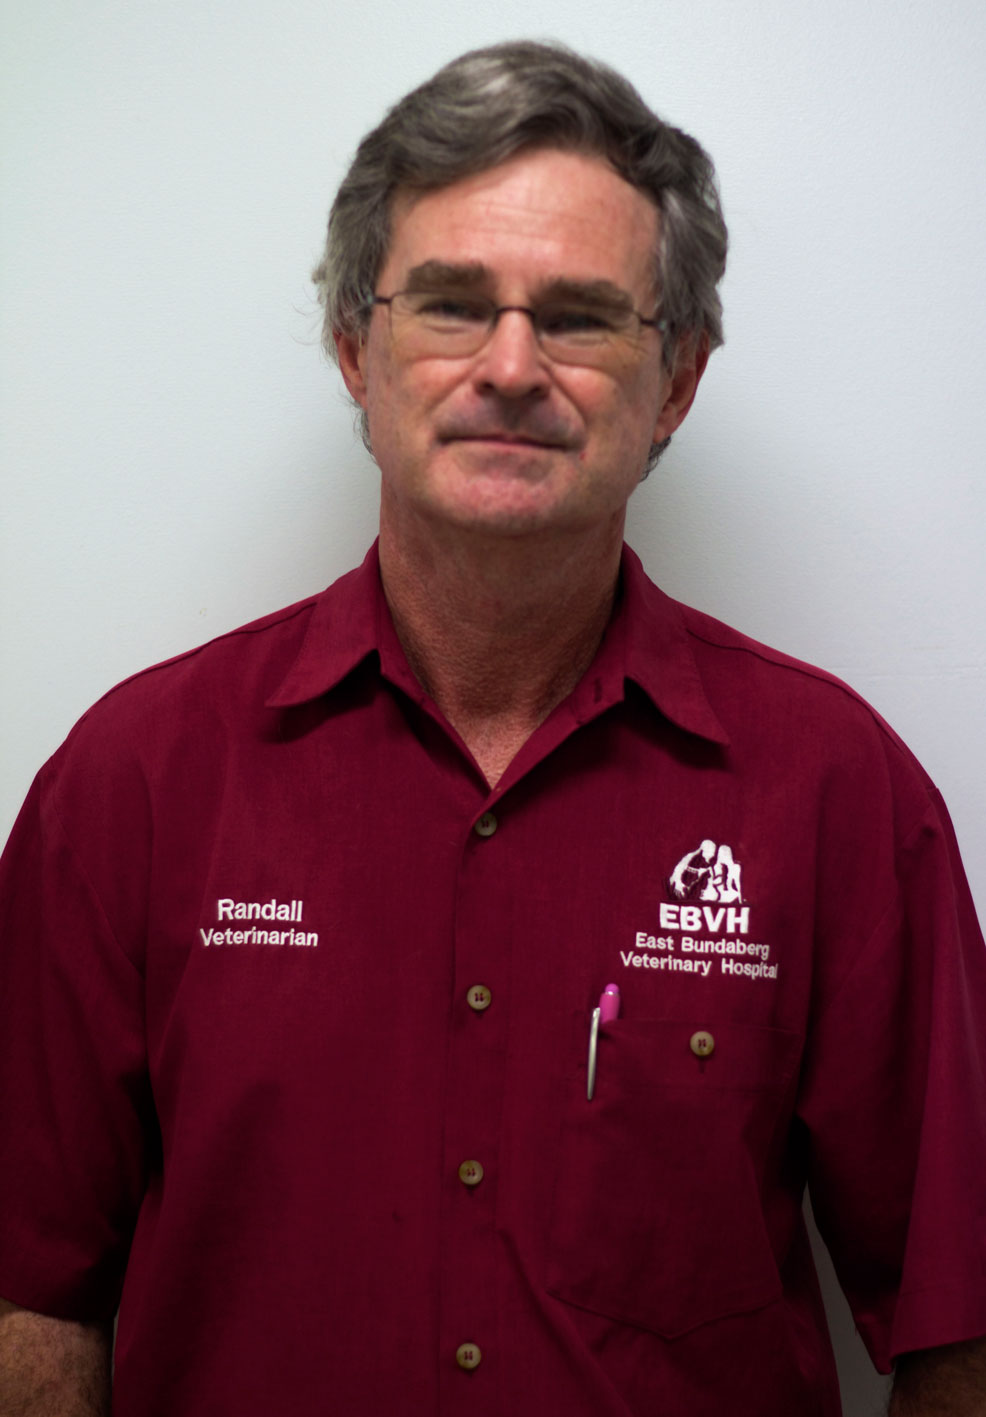 Dr Randall Keyes